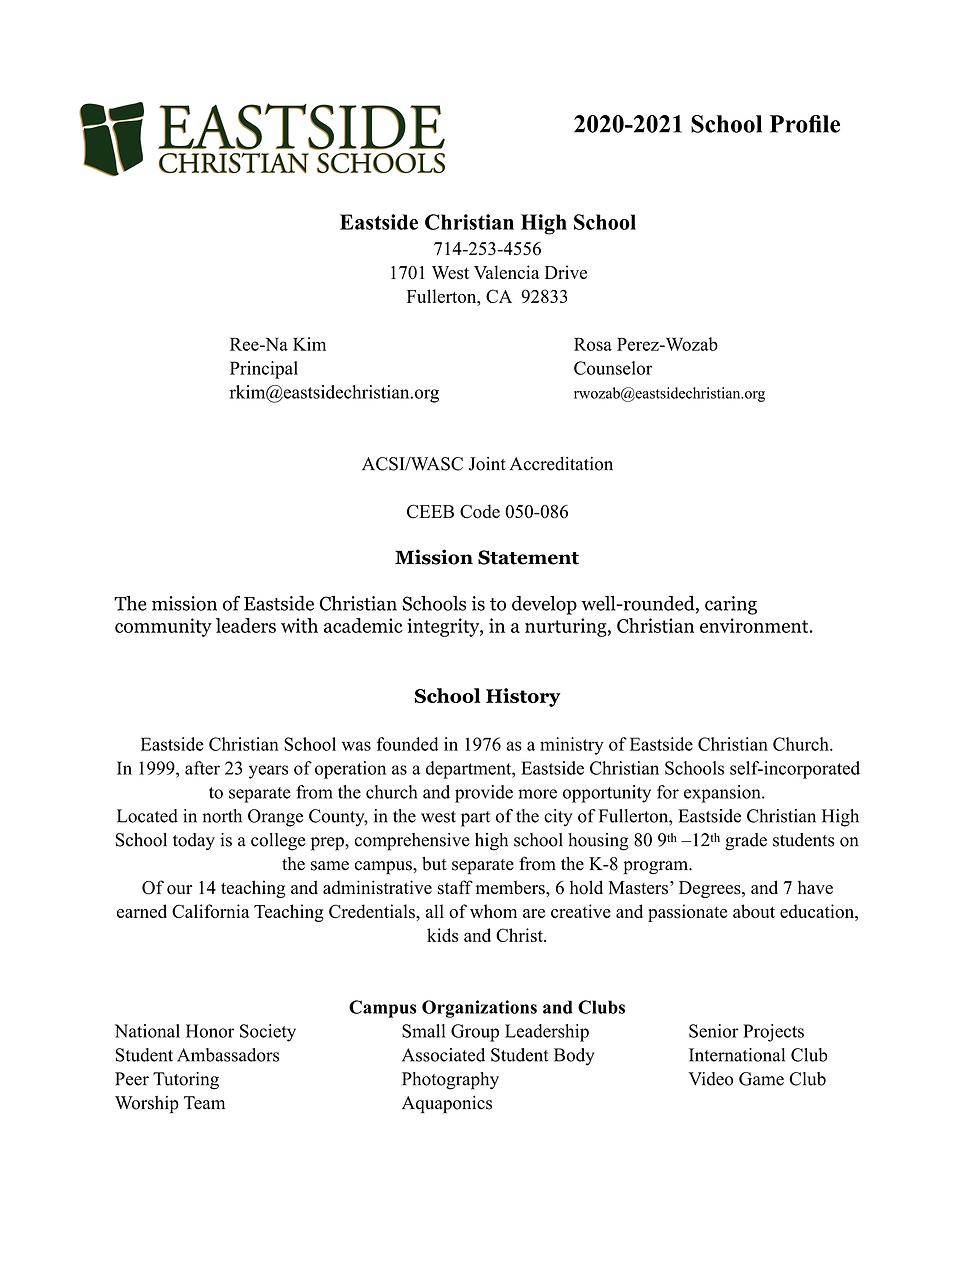 School Profile 2020-2021 pdf.png